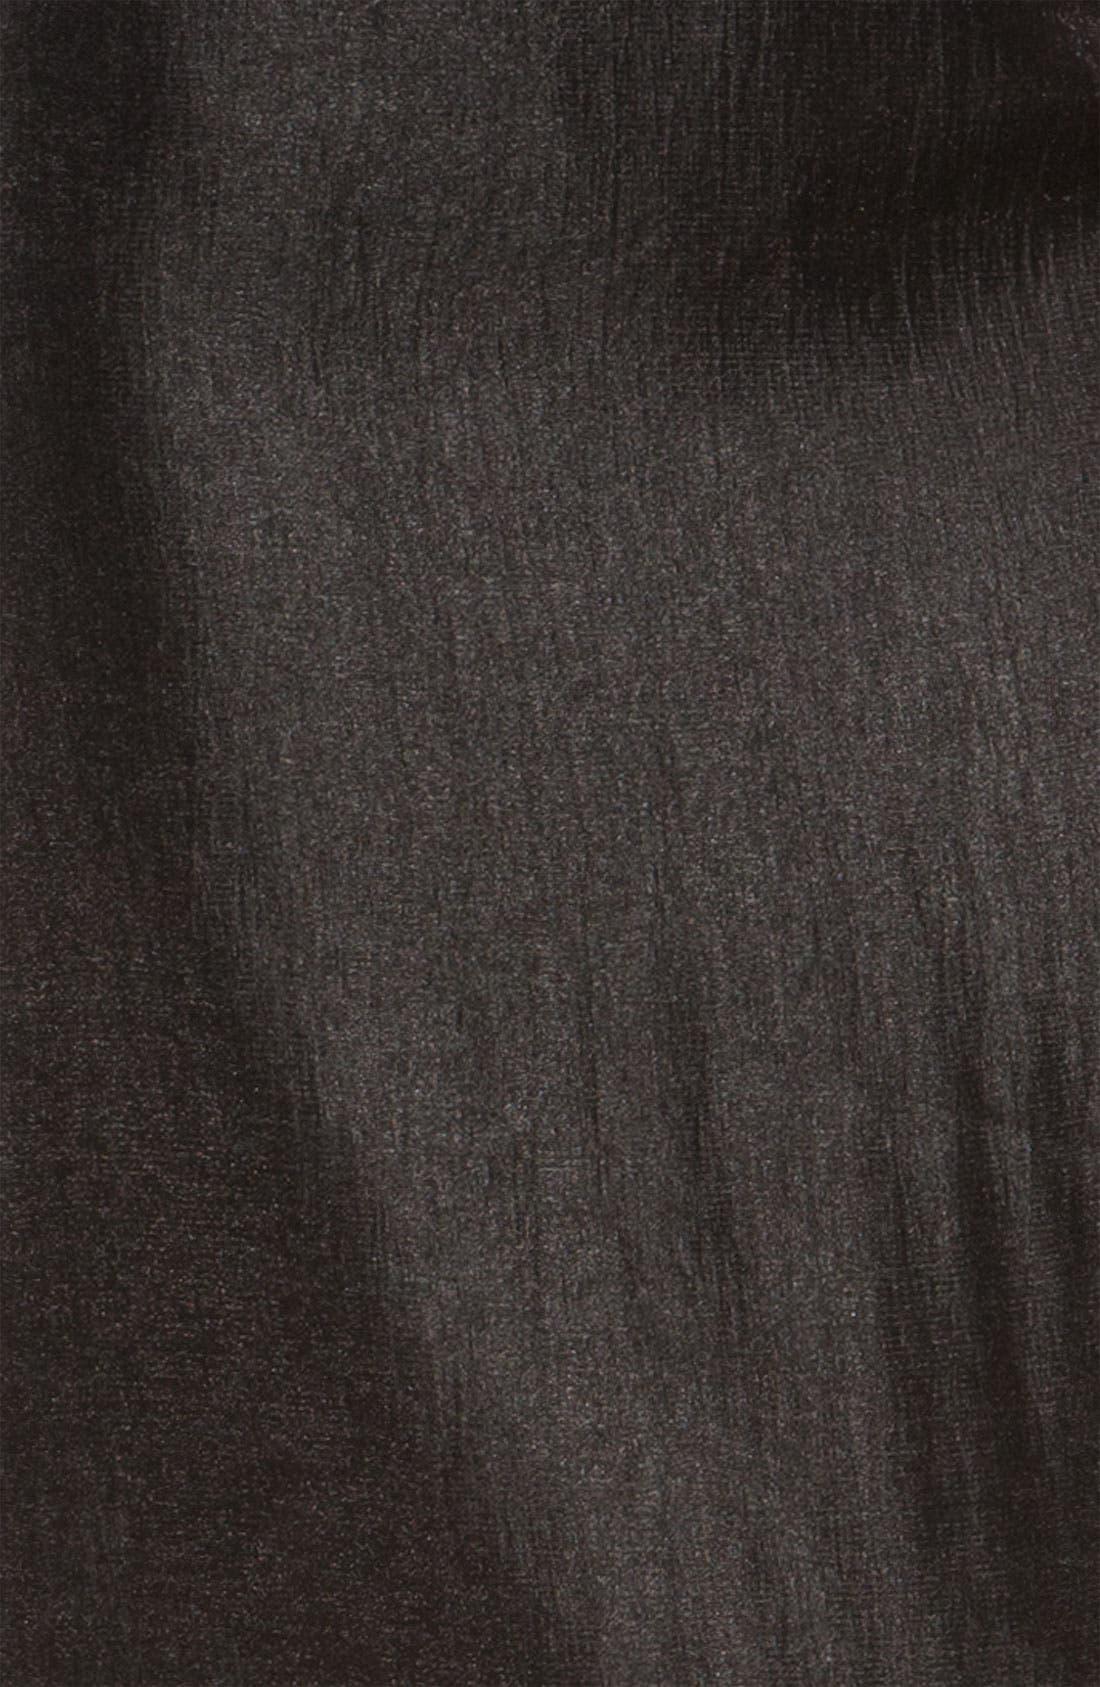 Alternate Image 2  - Adrianna Papell Metallic Pencil Skirt